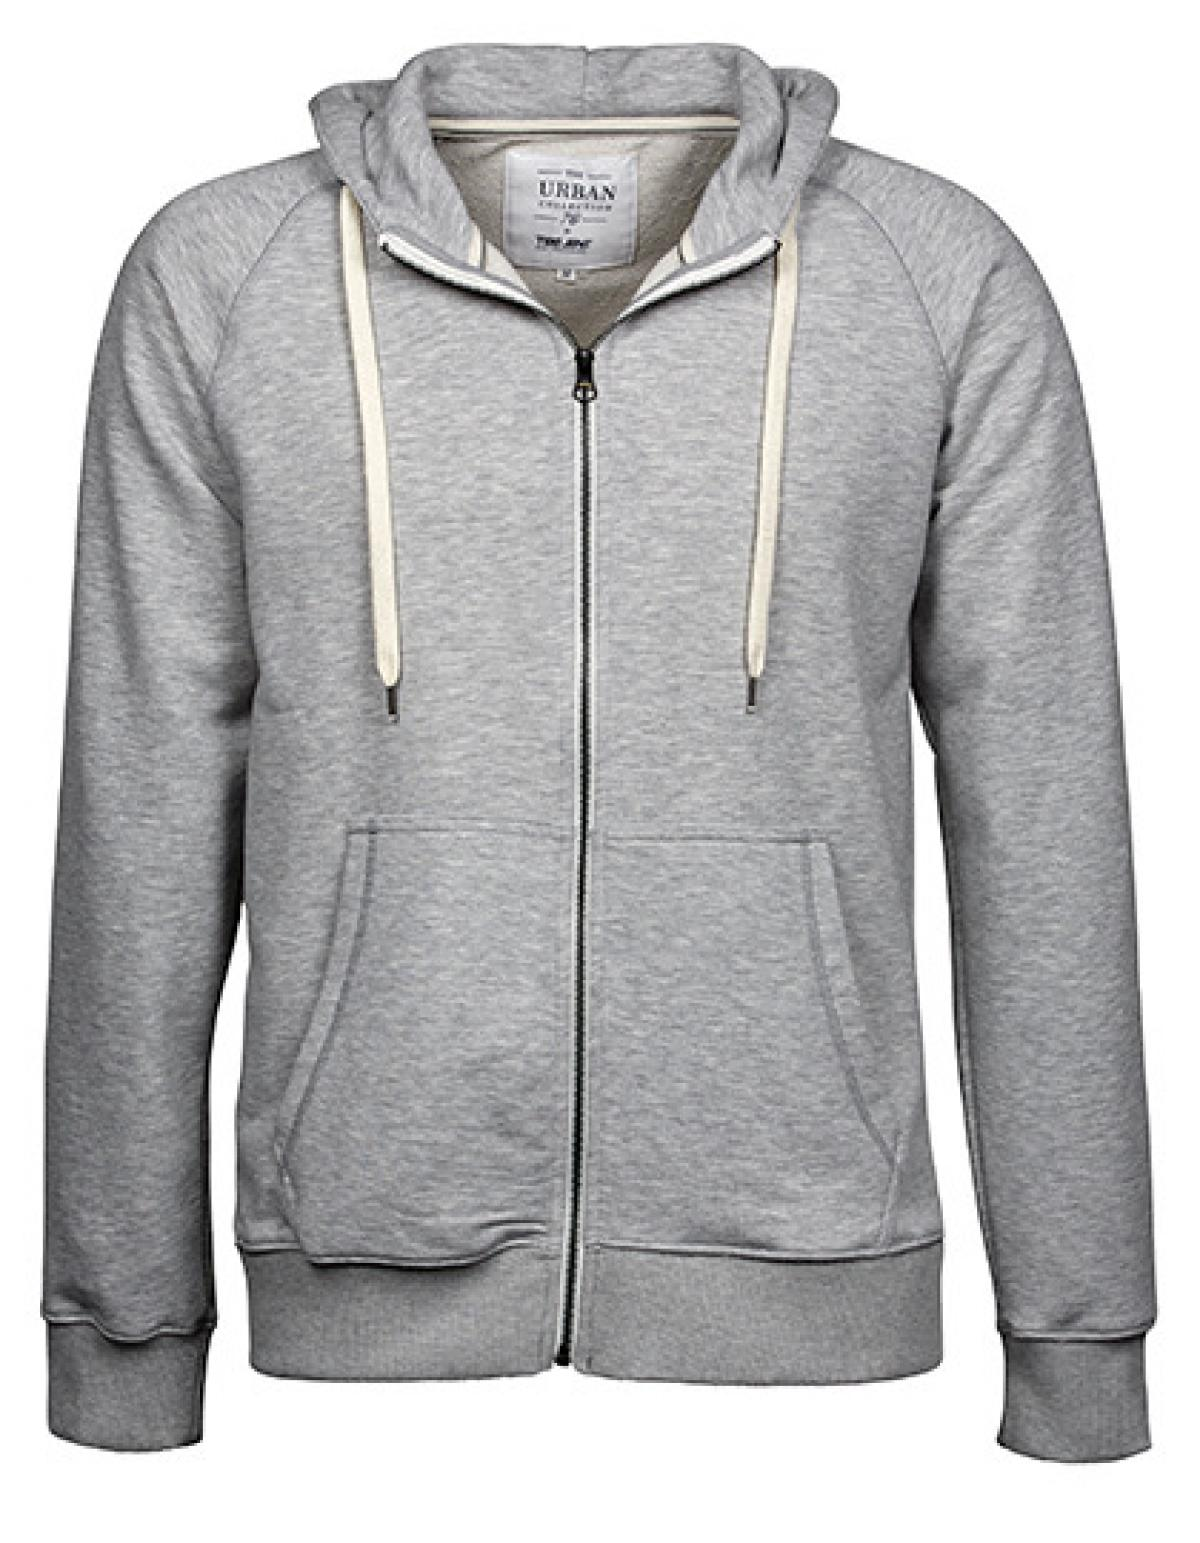 herren urban zip hoodie modisch lockerer schnitt rexlander s. Black Bedroom Furniture Sets. Home Design Ideas